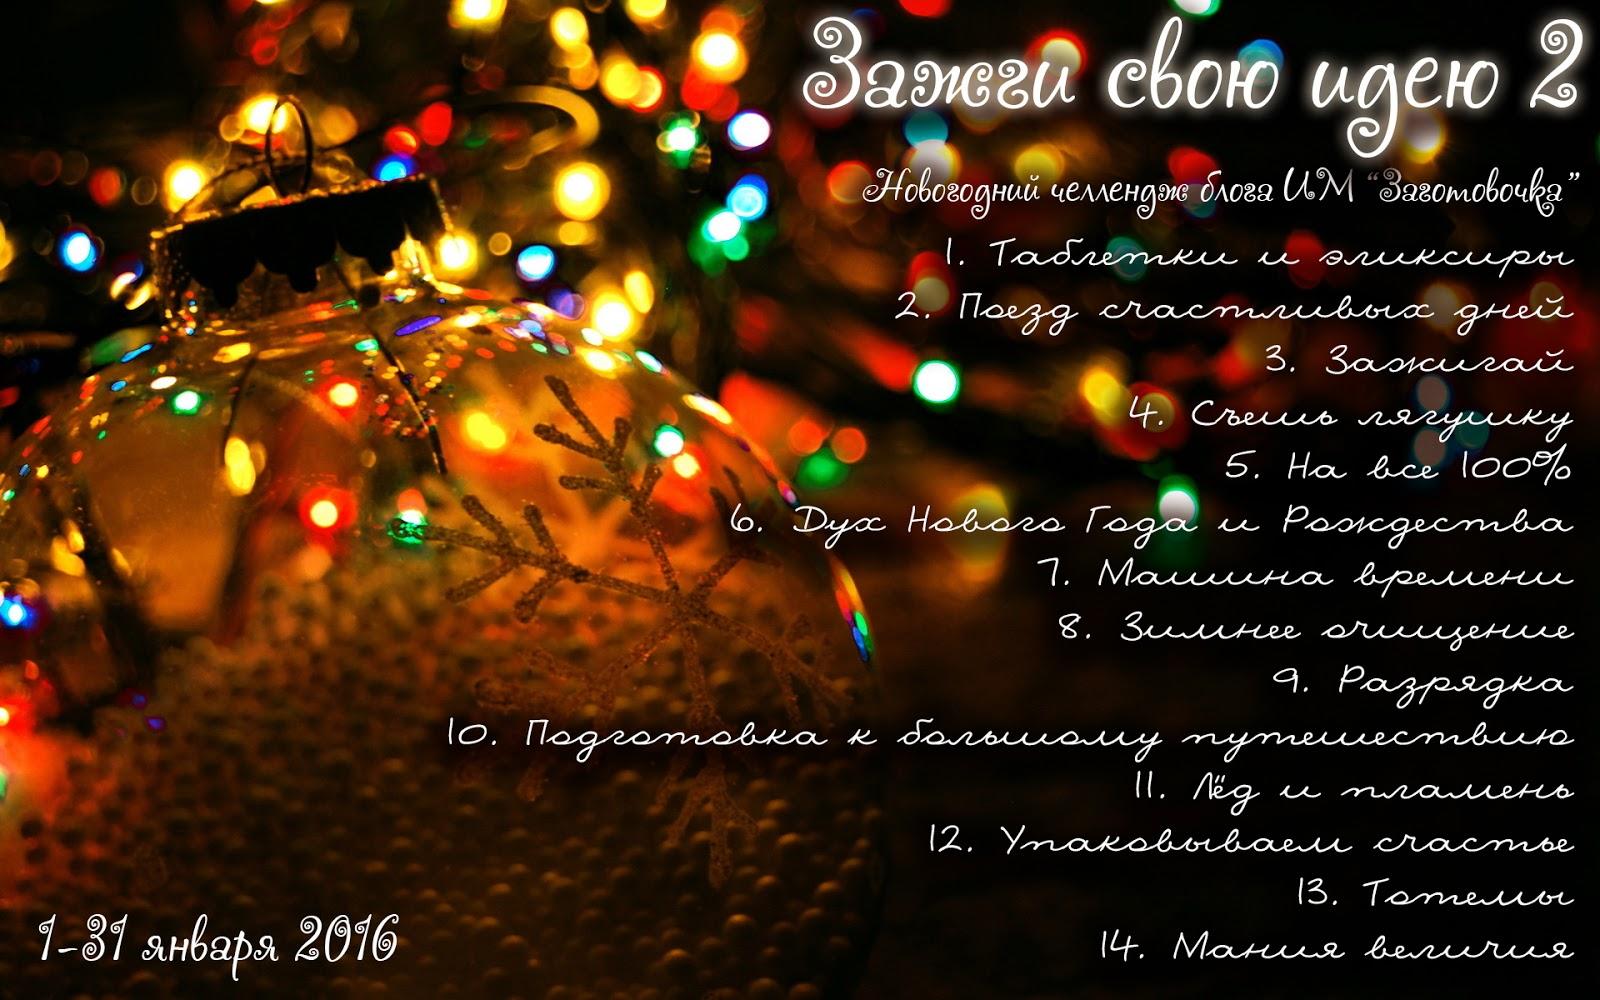 http://zagotovo4ka.blogspot.ru/2015/12/2.html